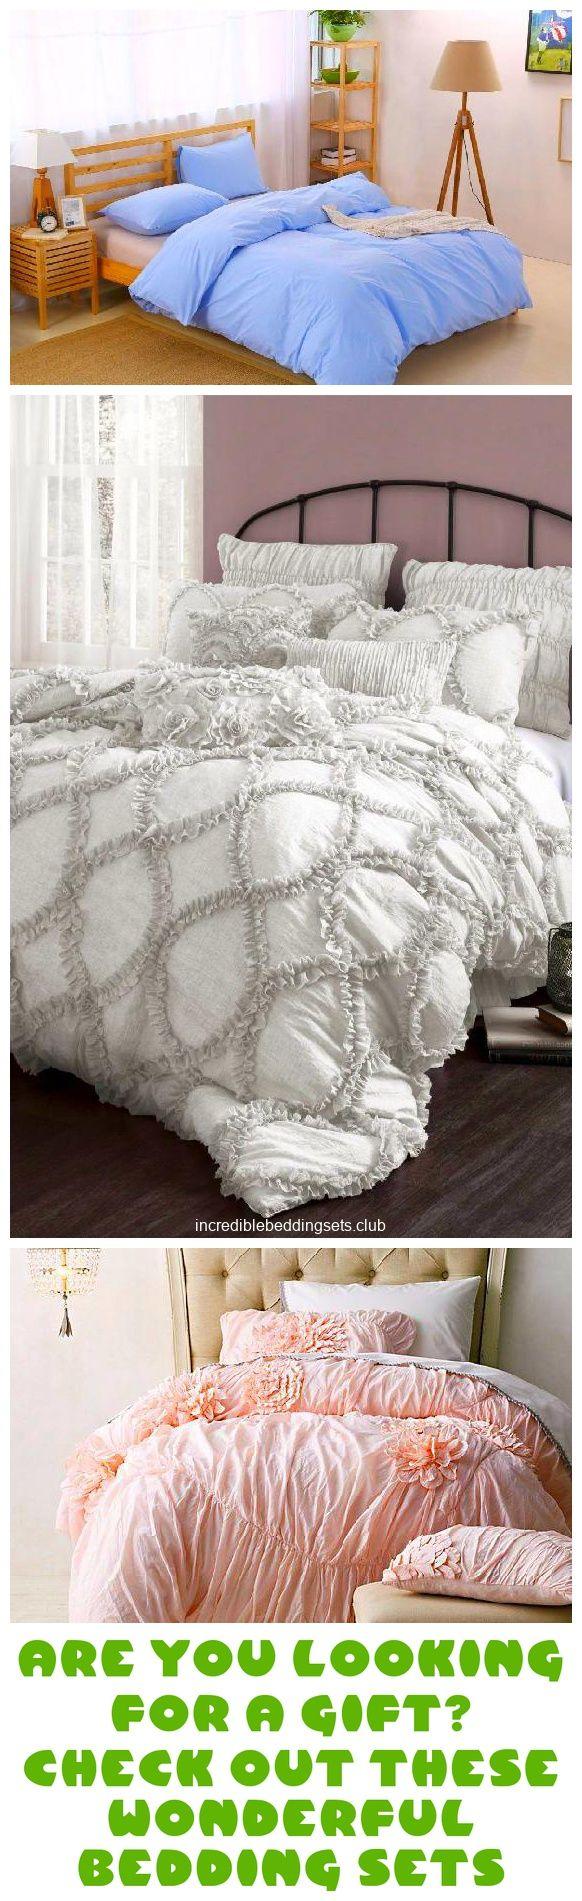 top bed linen ideas item id duvercovers